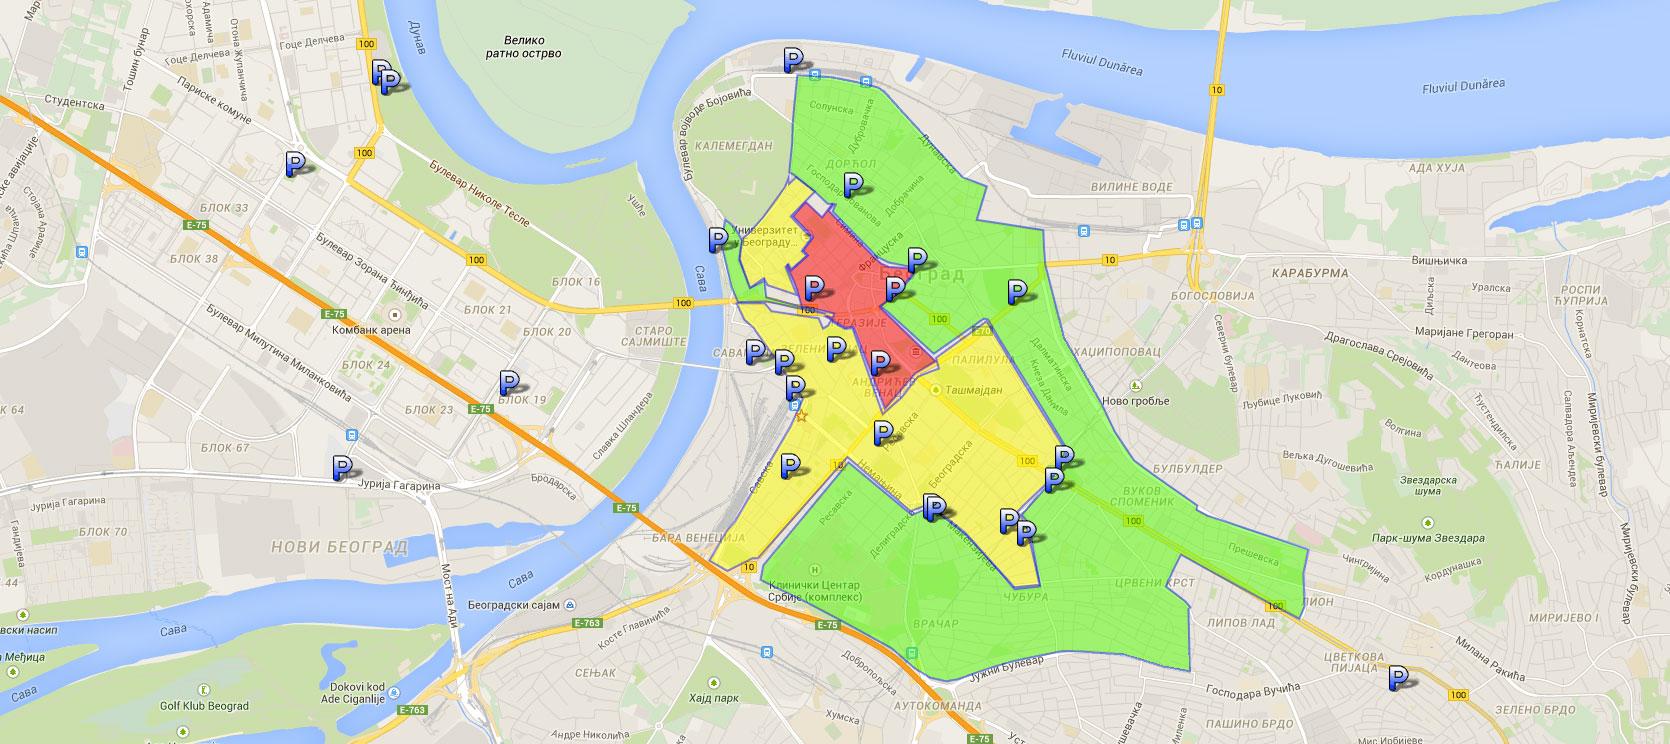 mapa parking zona beograd Duletov blog | Parkiranje, garaže i zone u Beogradu mapa parking zona beograd